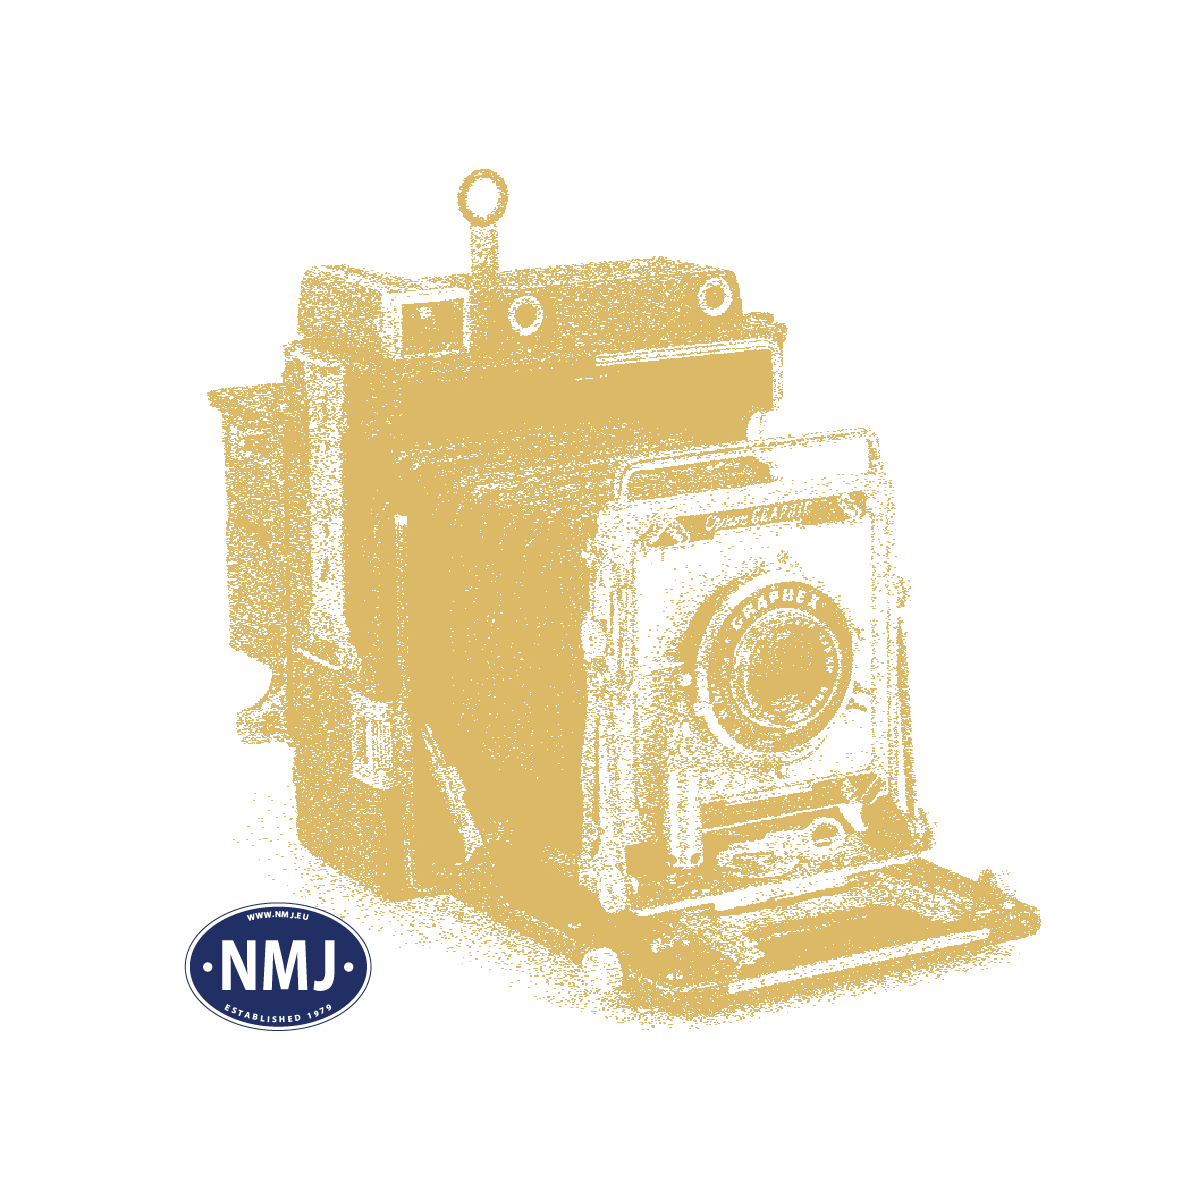 NOC12020 - På Plattformen, Figurer og kiosk